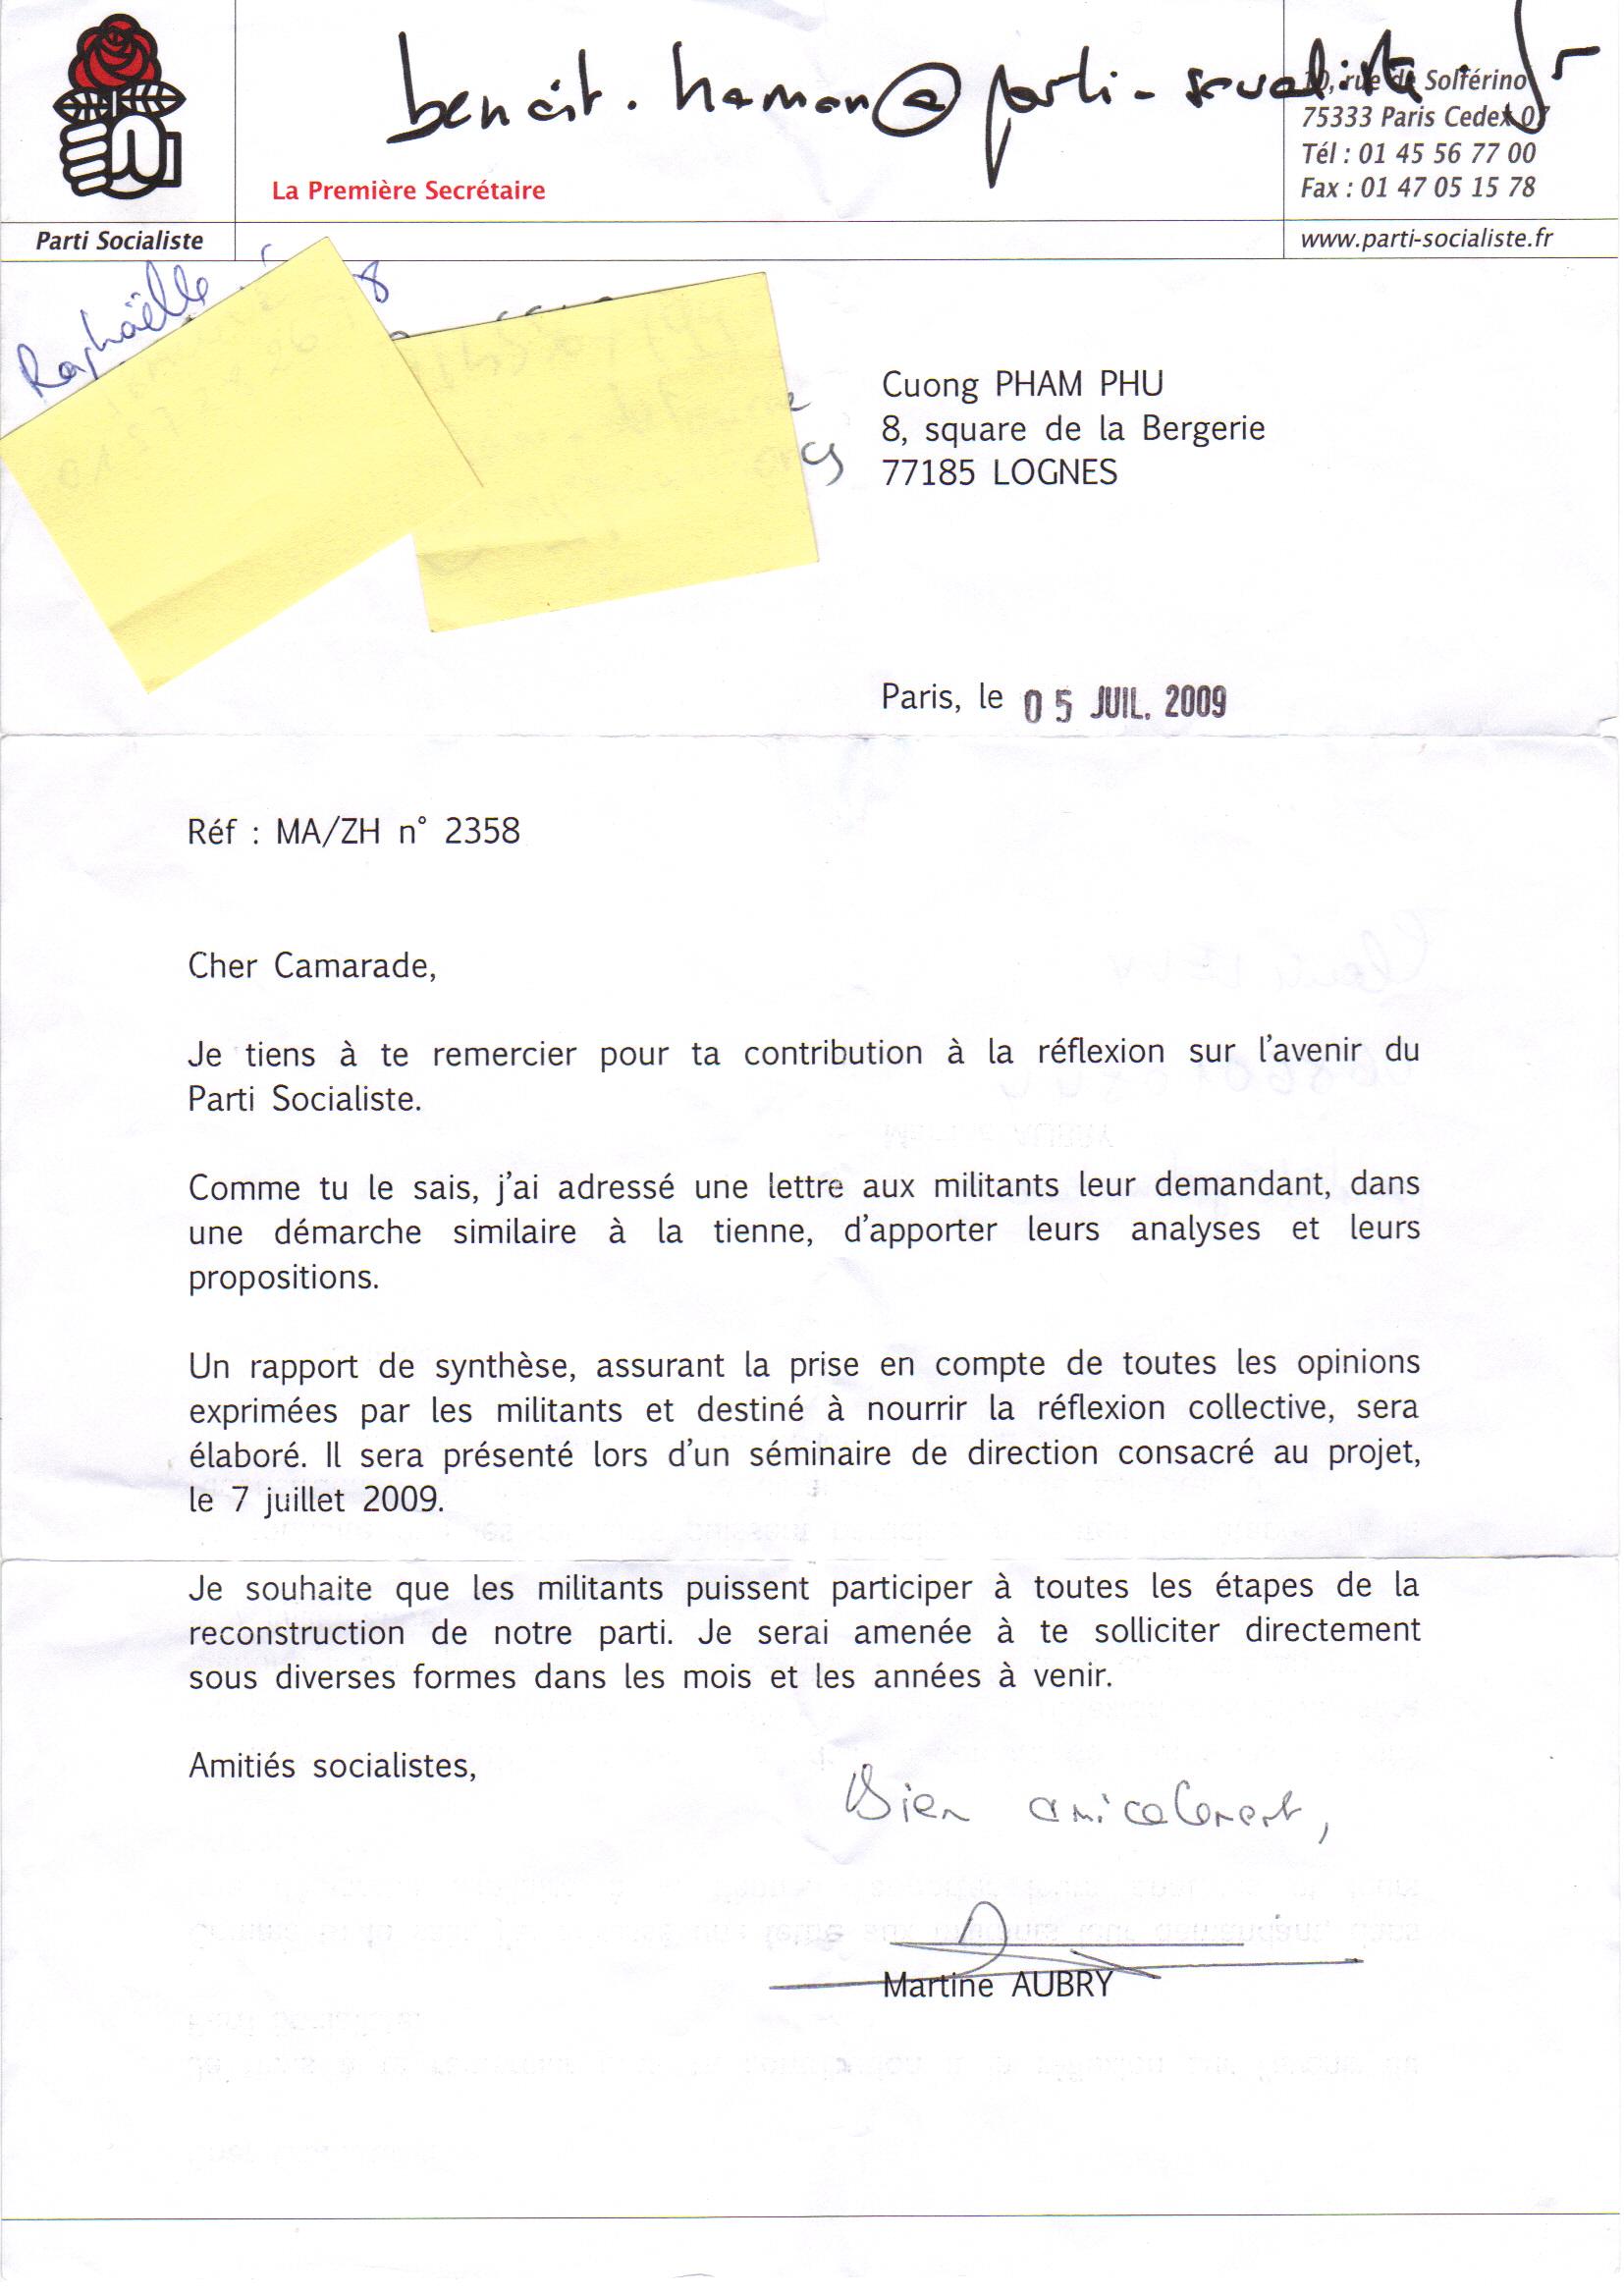 25-08-2011-lettre-de-martine-aubry.JPG